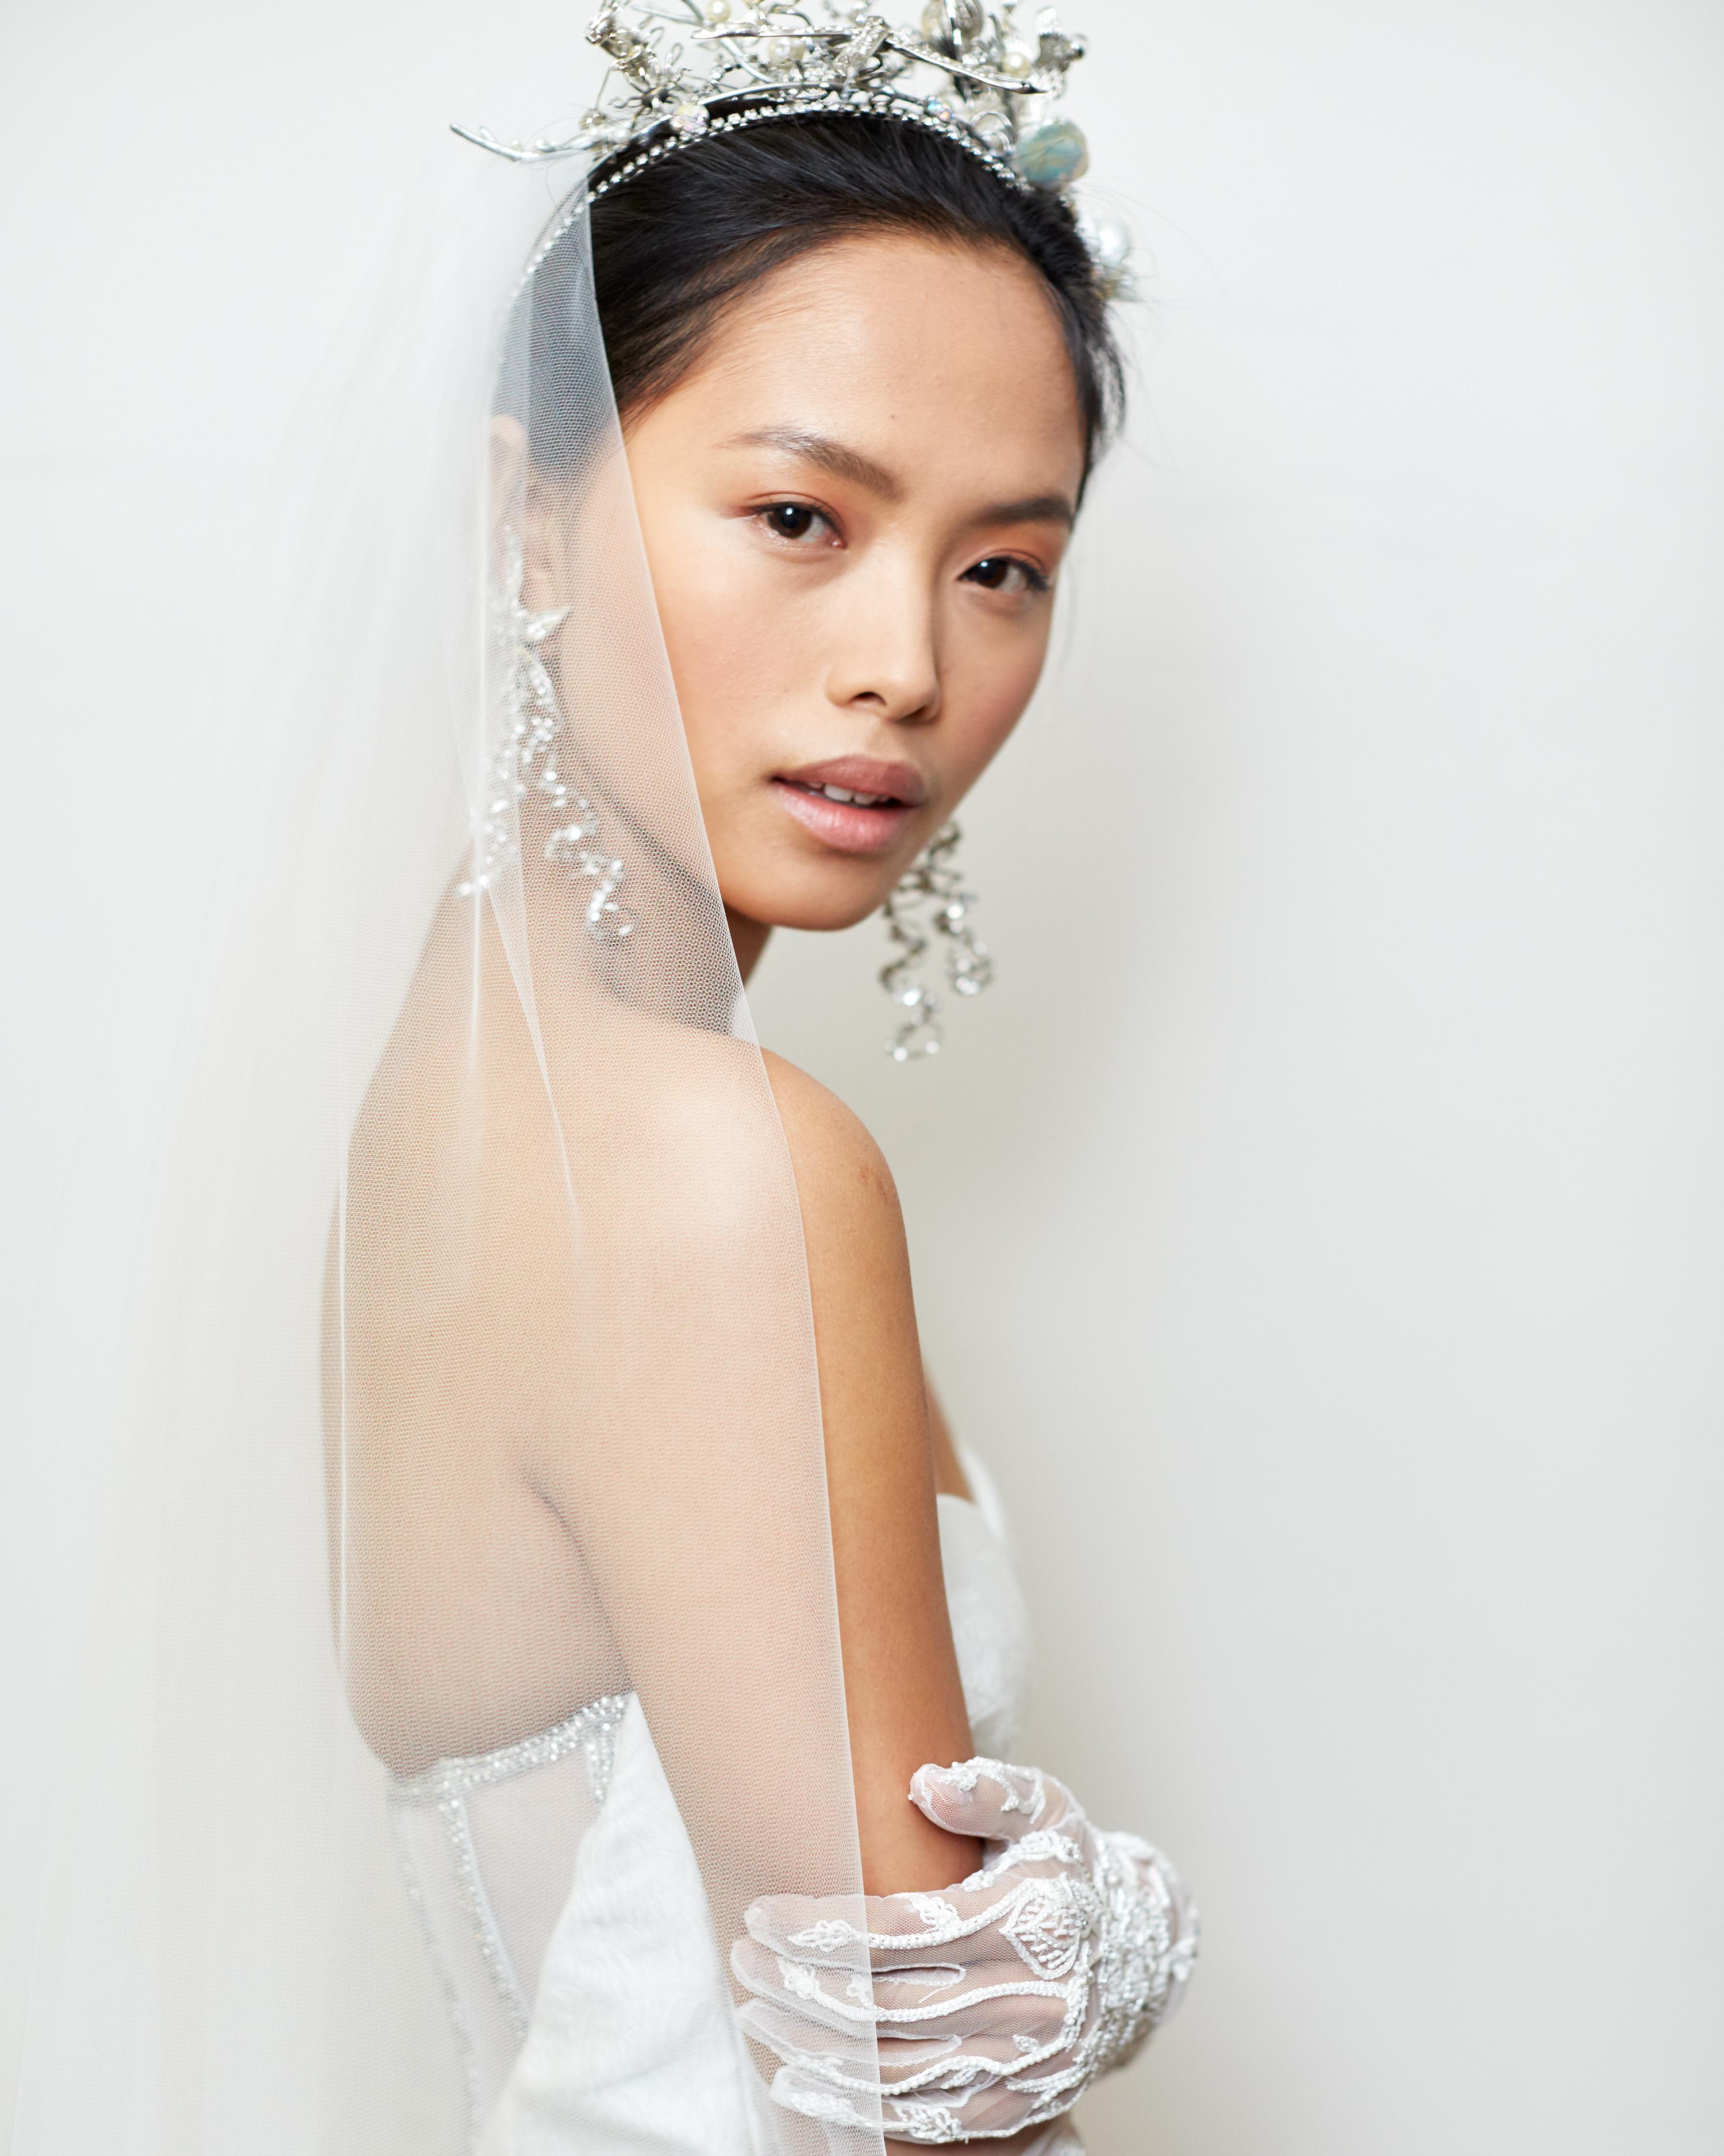 expert-beauty-tips-naeem-khan-spring2016-glowing-complexion-0415.jpg